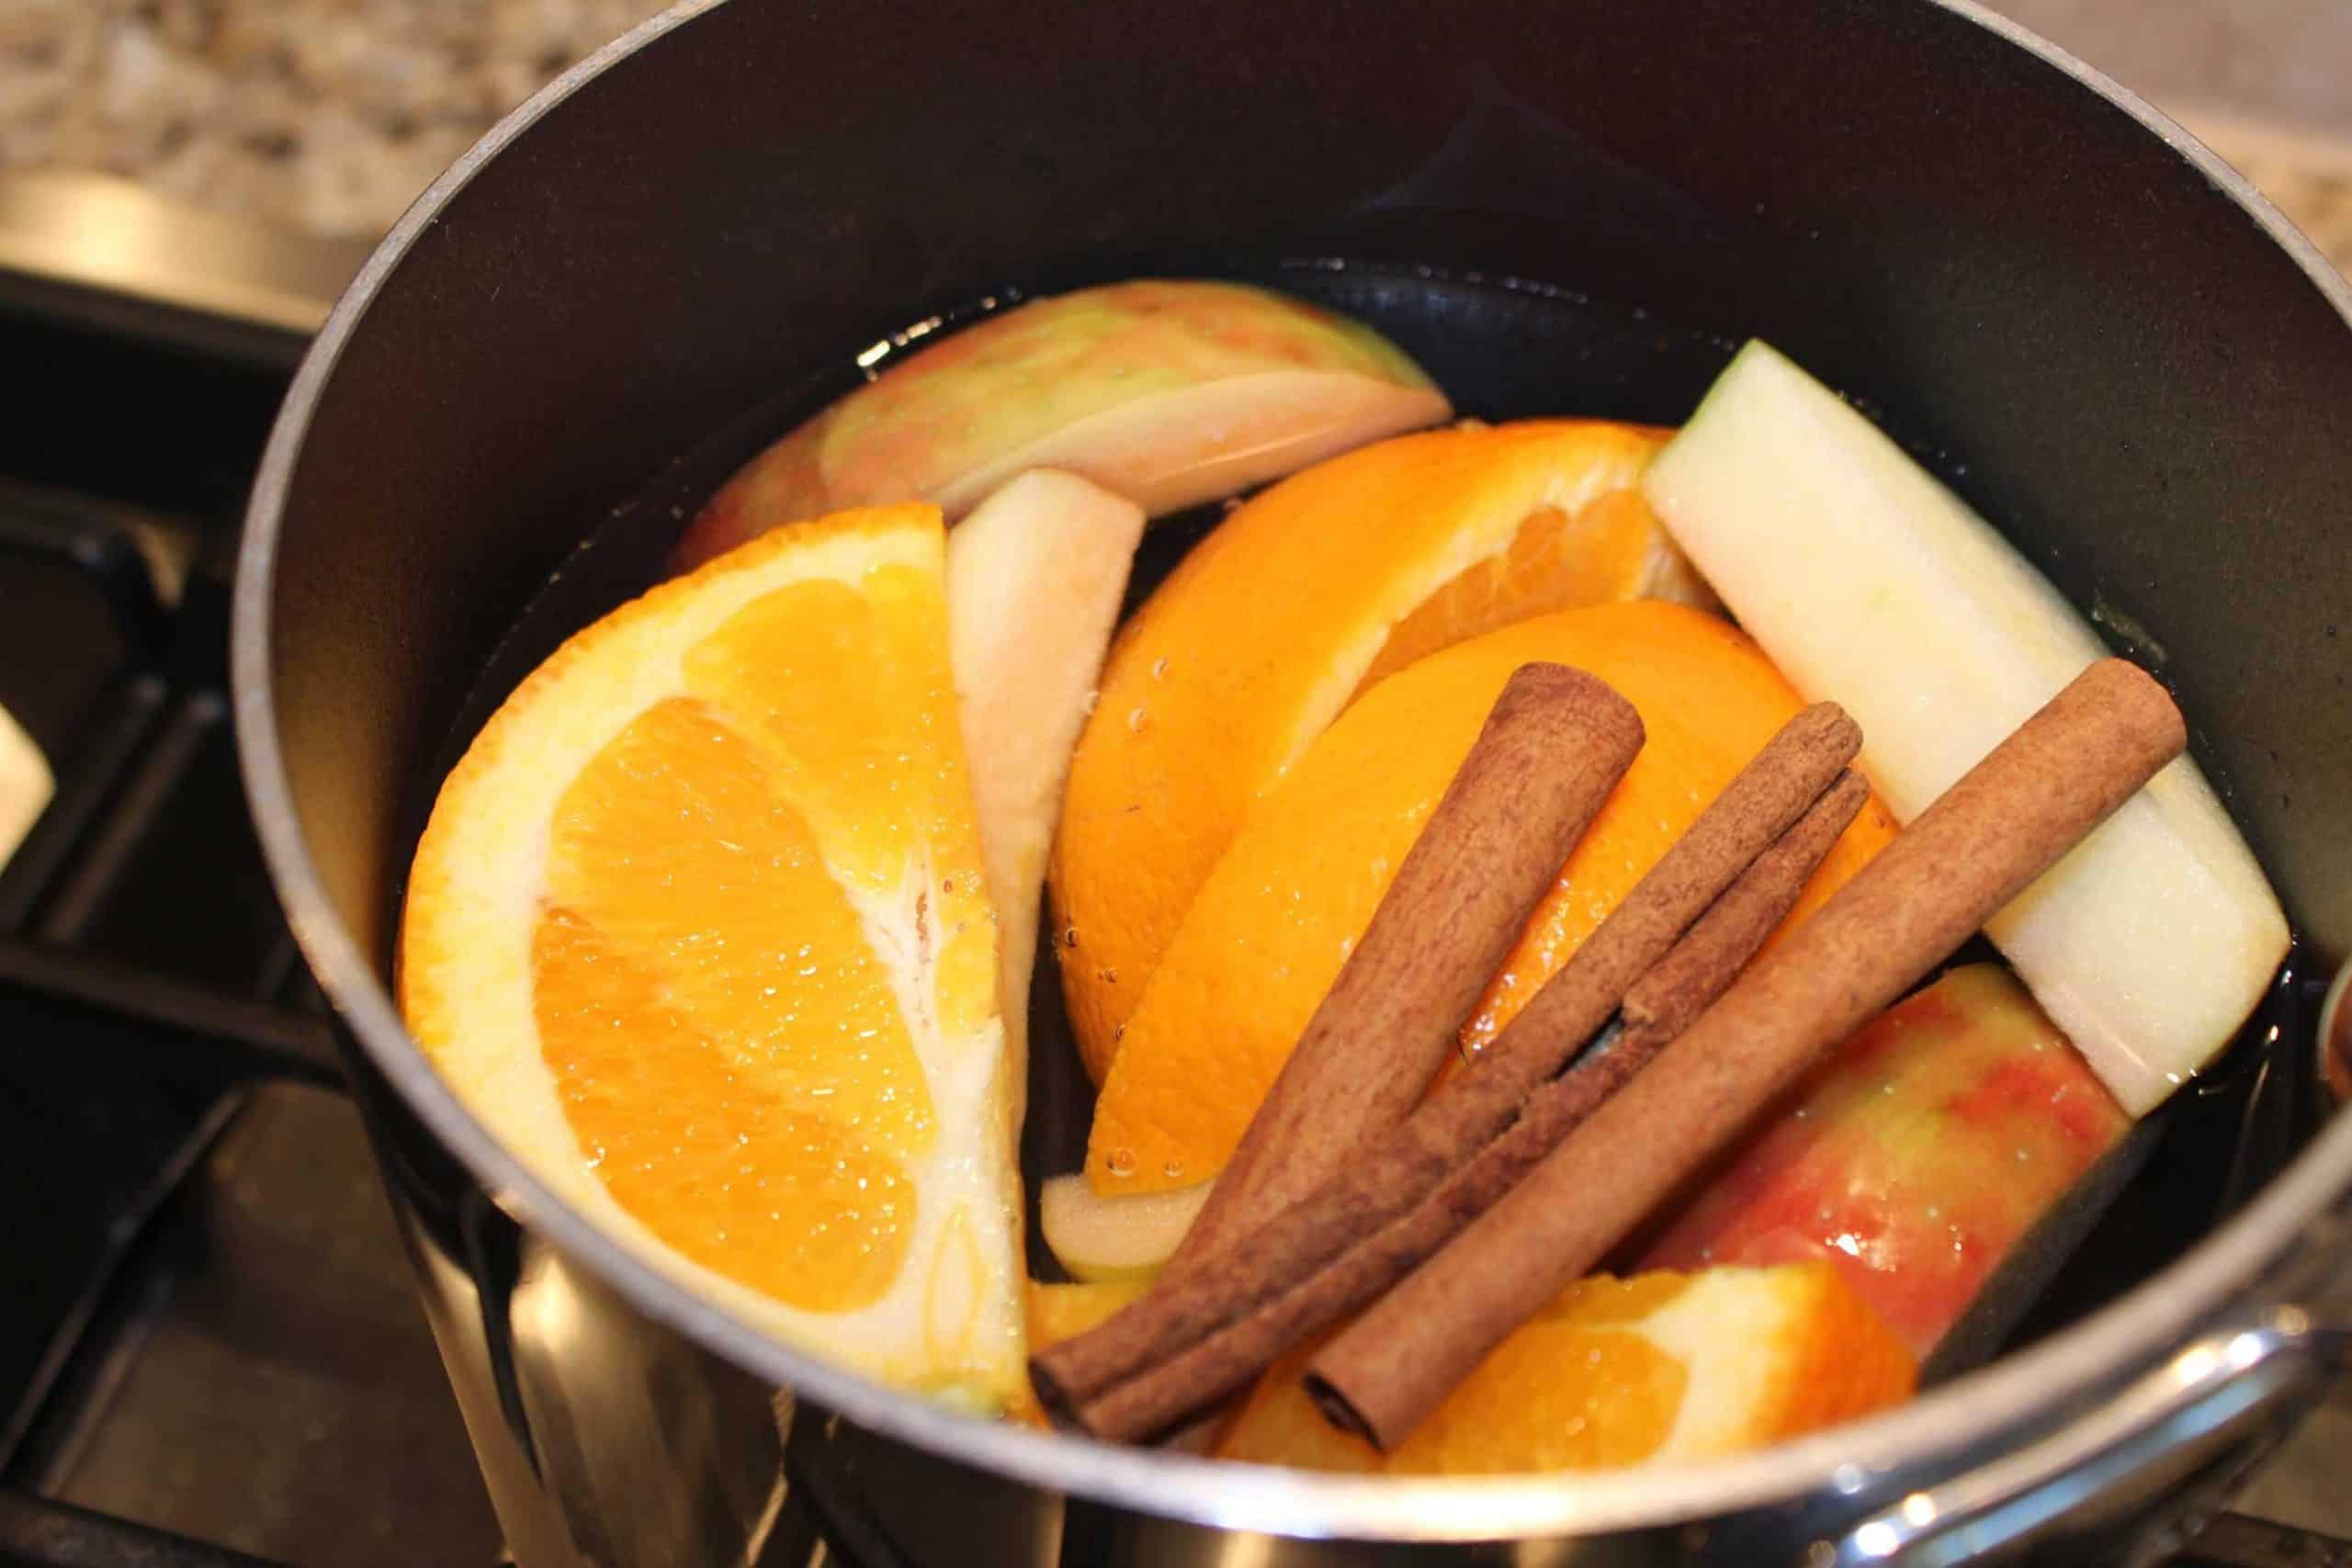 Homemade Holiday Kitchen Potpourri!